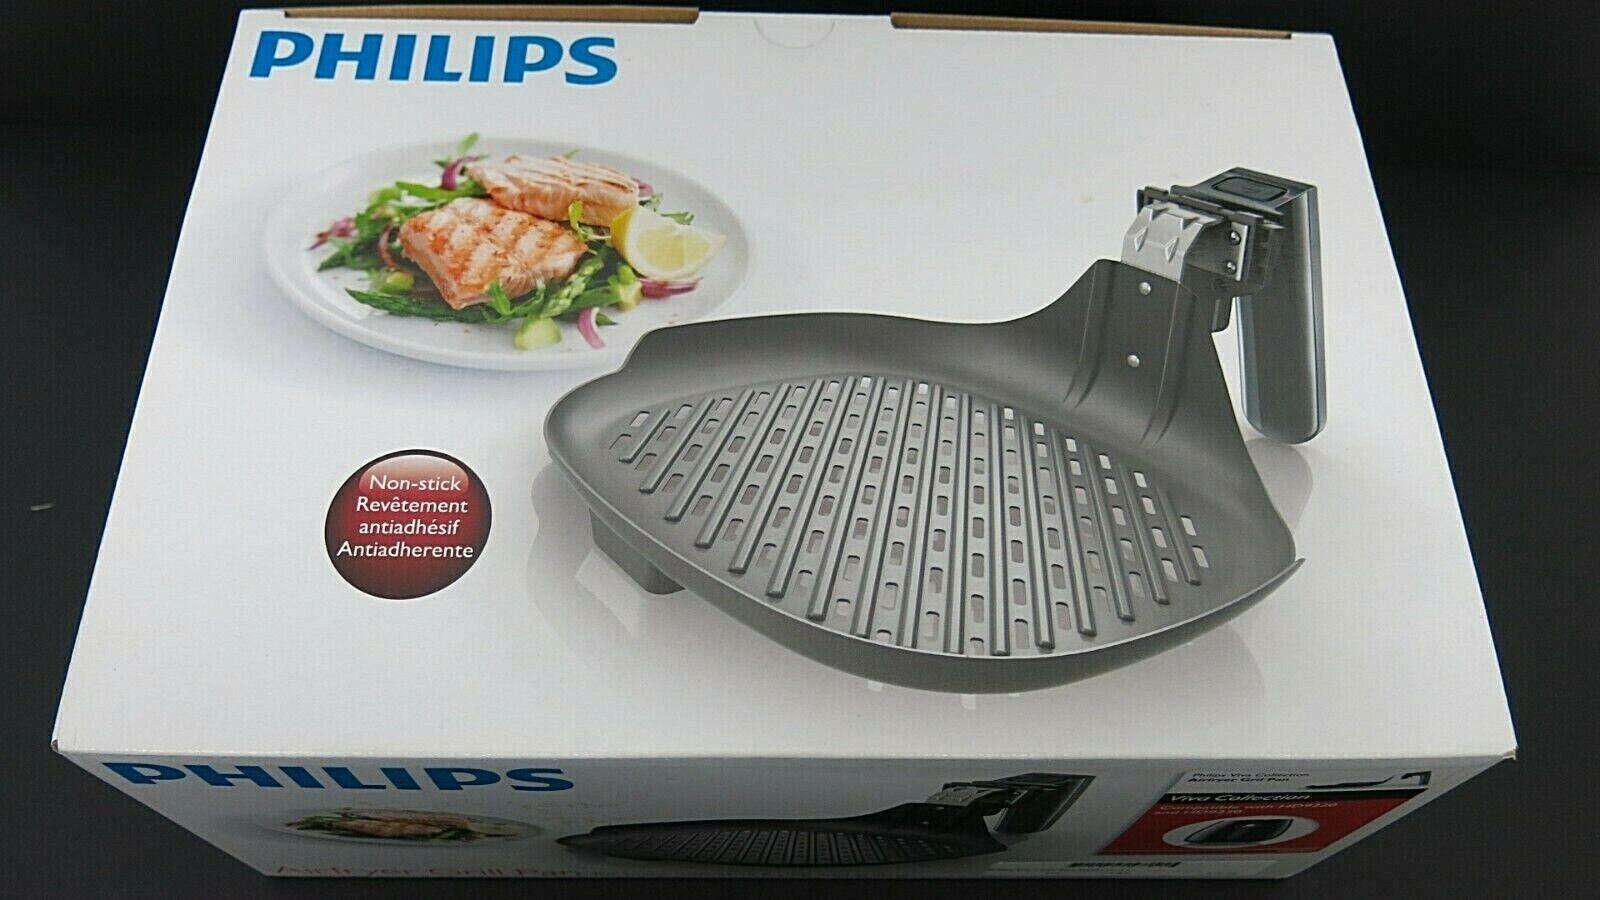 Philips Xxl Non Stick Airfryer Grill Master Kit For Sale Online Ebay